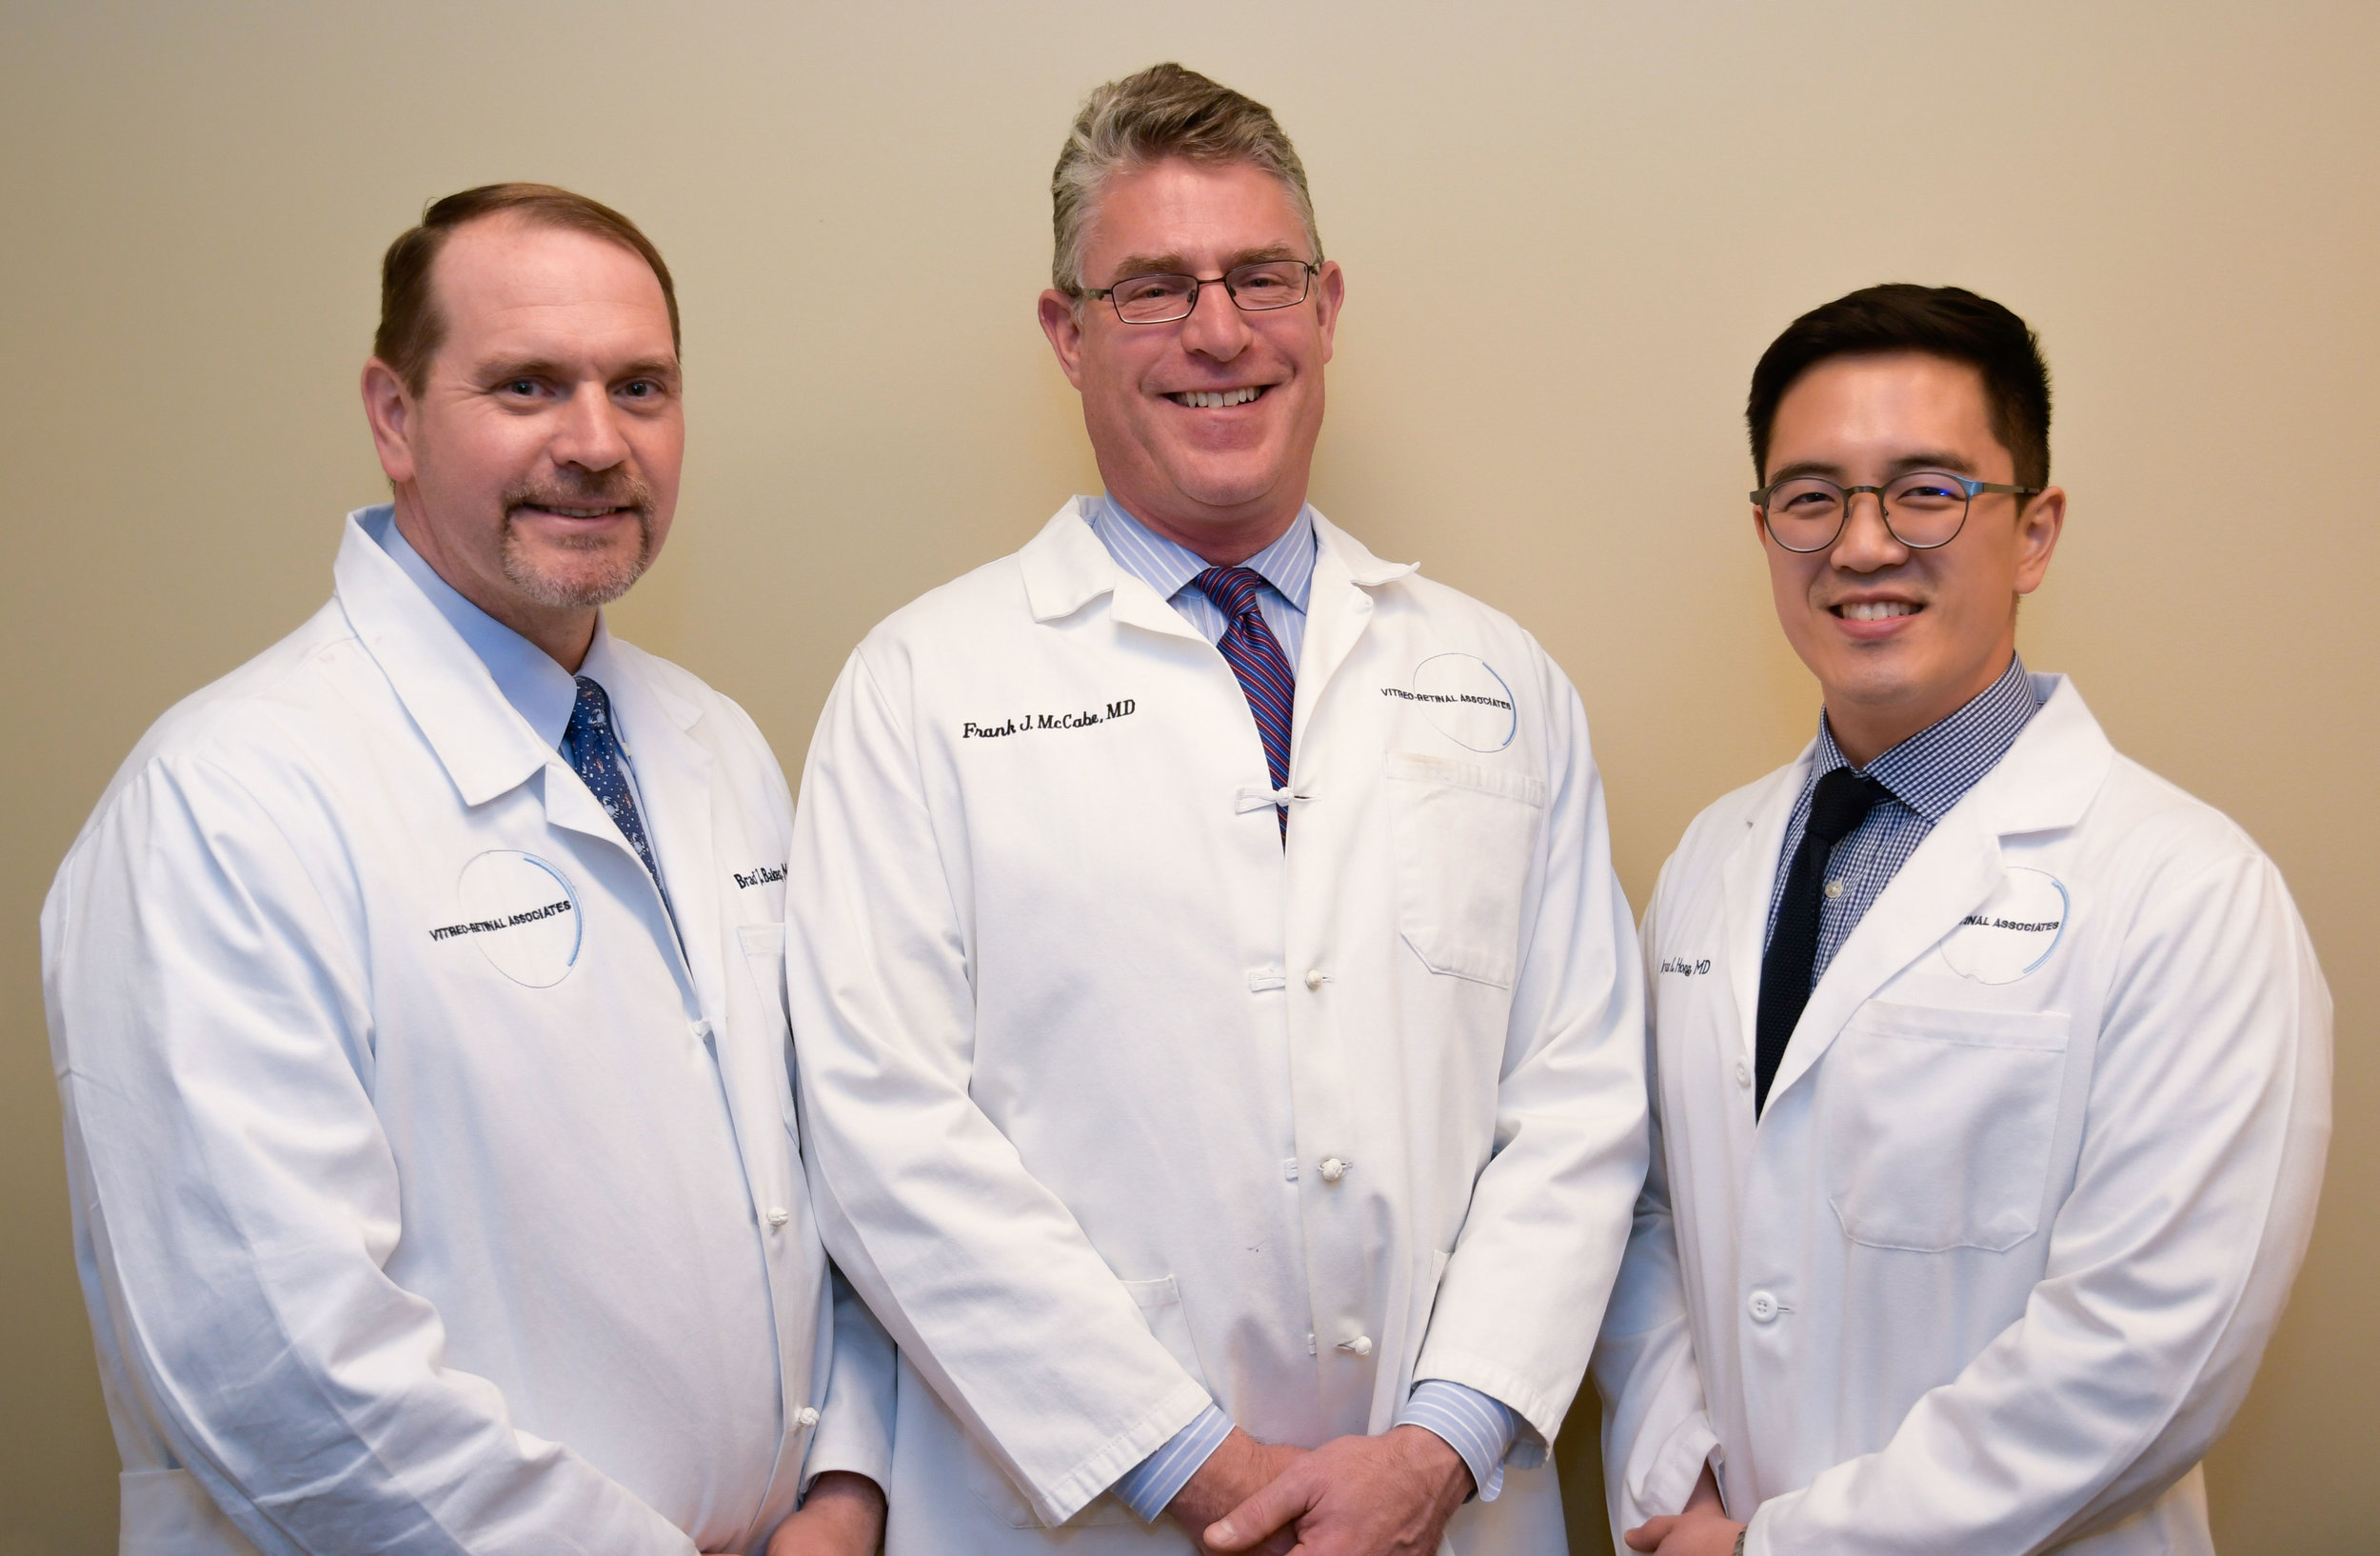 Drs. Baker, McCabe, and Hong